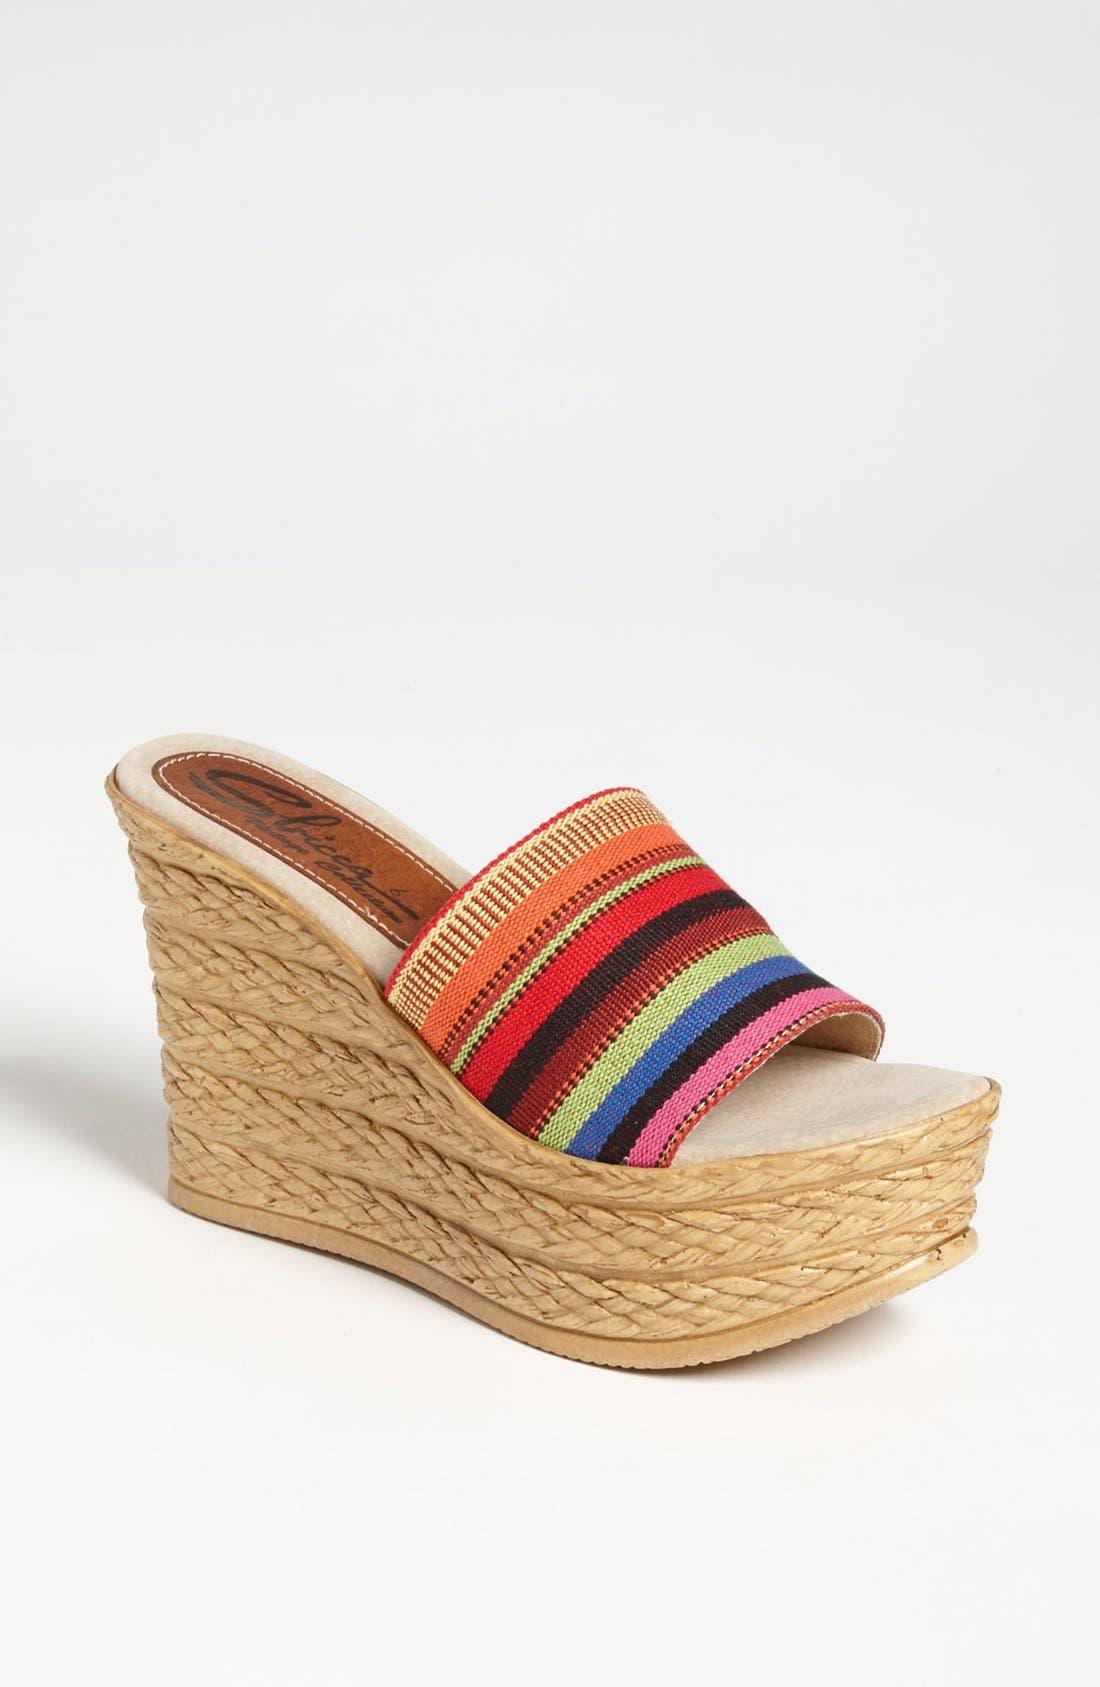 Alternate Image 1 Selected - Sbicca 'Onelove' Wedge Sandal